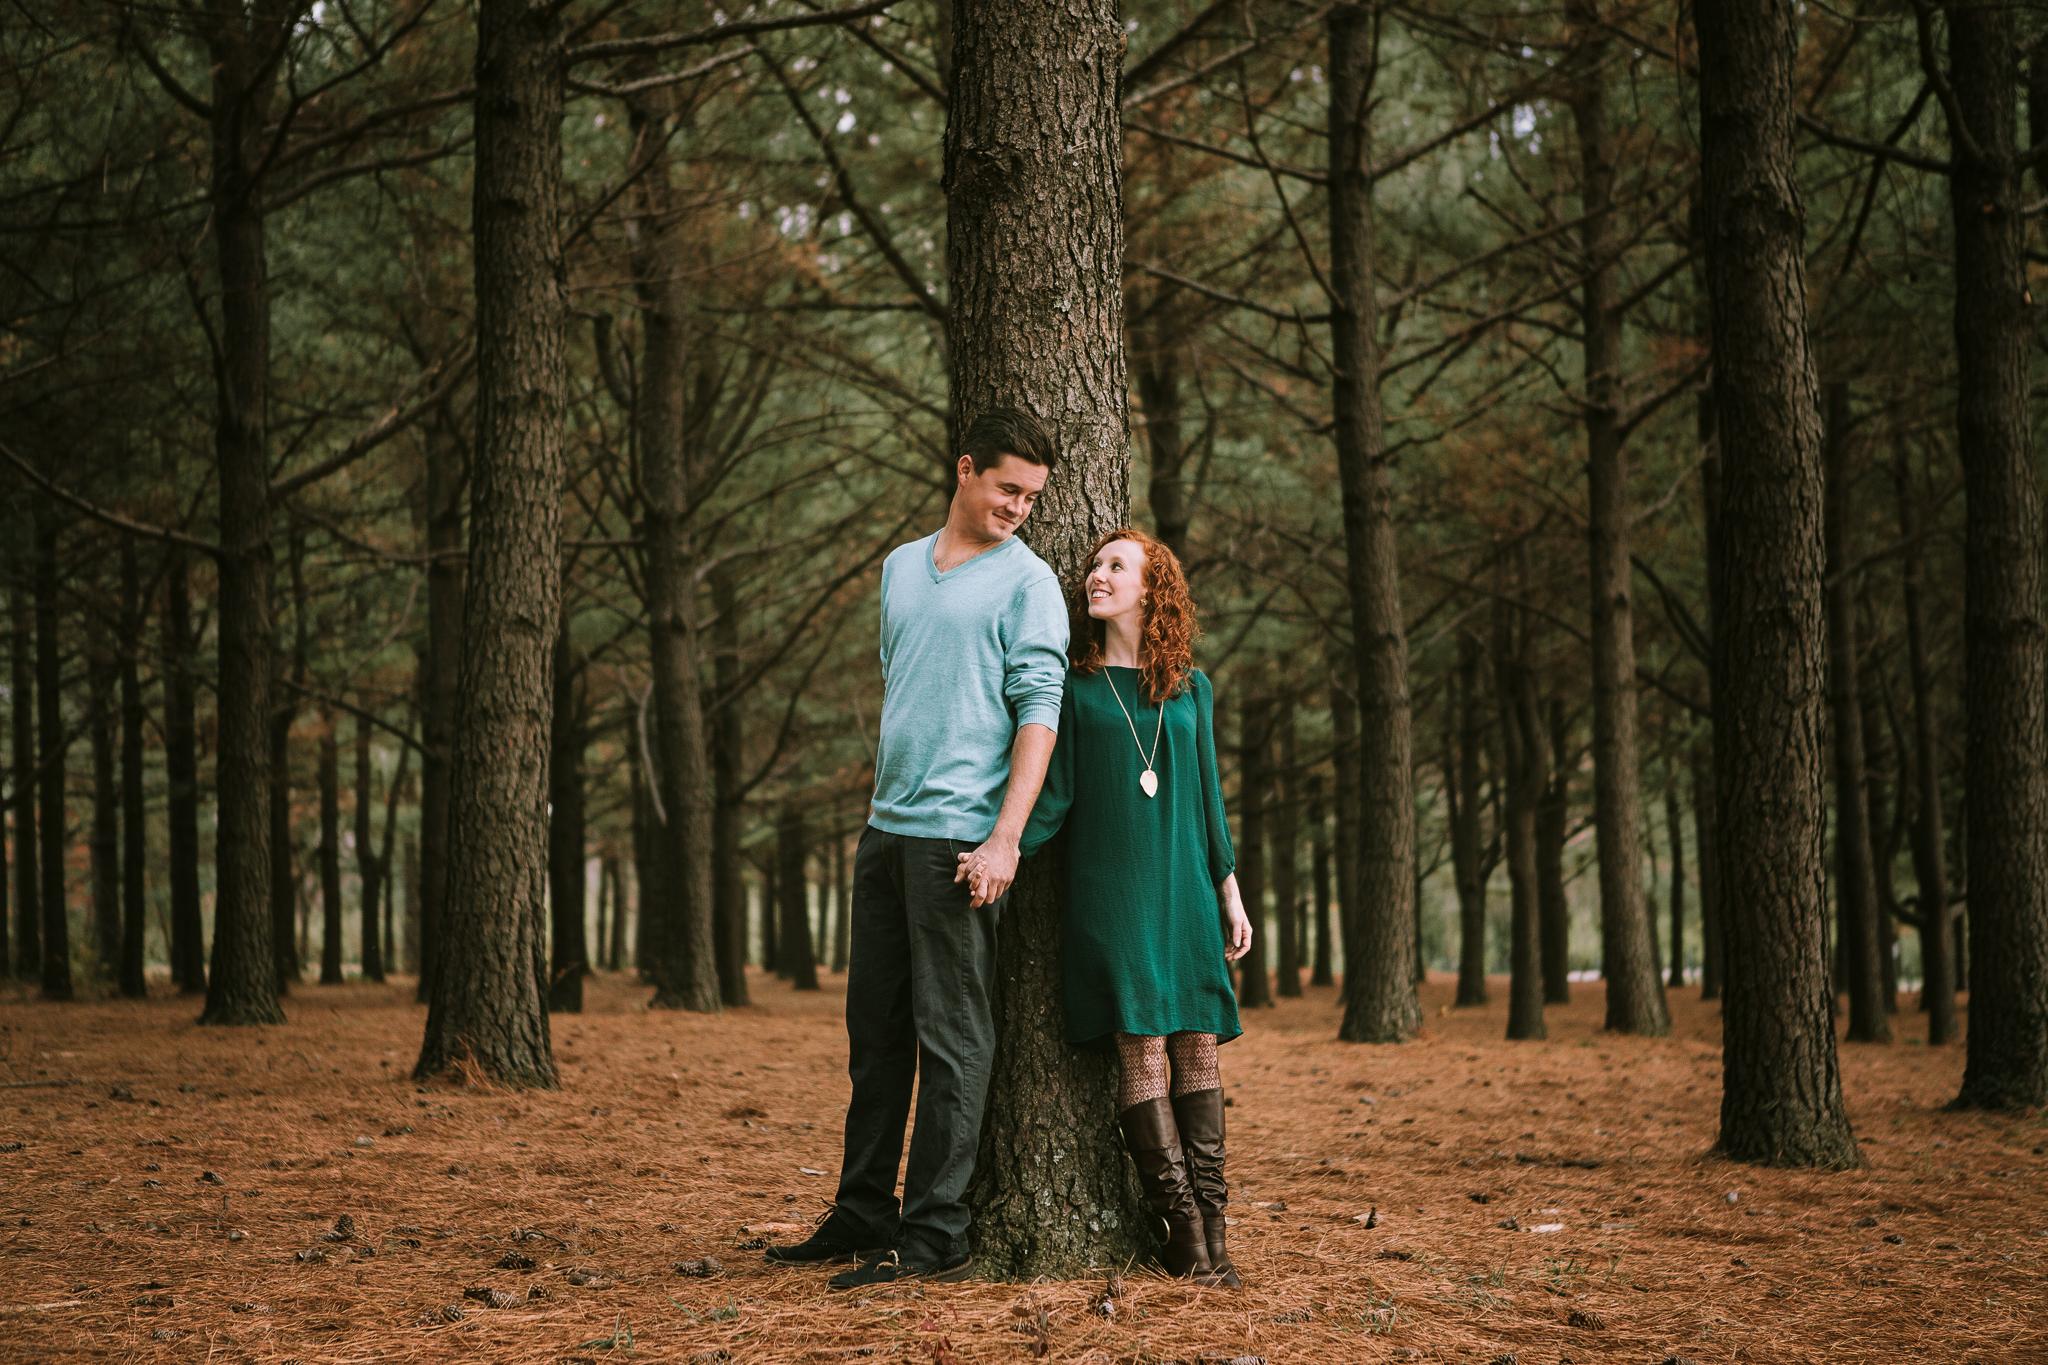 Richmond Kentucky Engagement Photographer - Ariana Jordan Photography -40.jpg